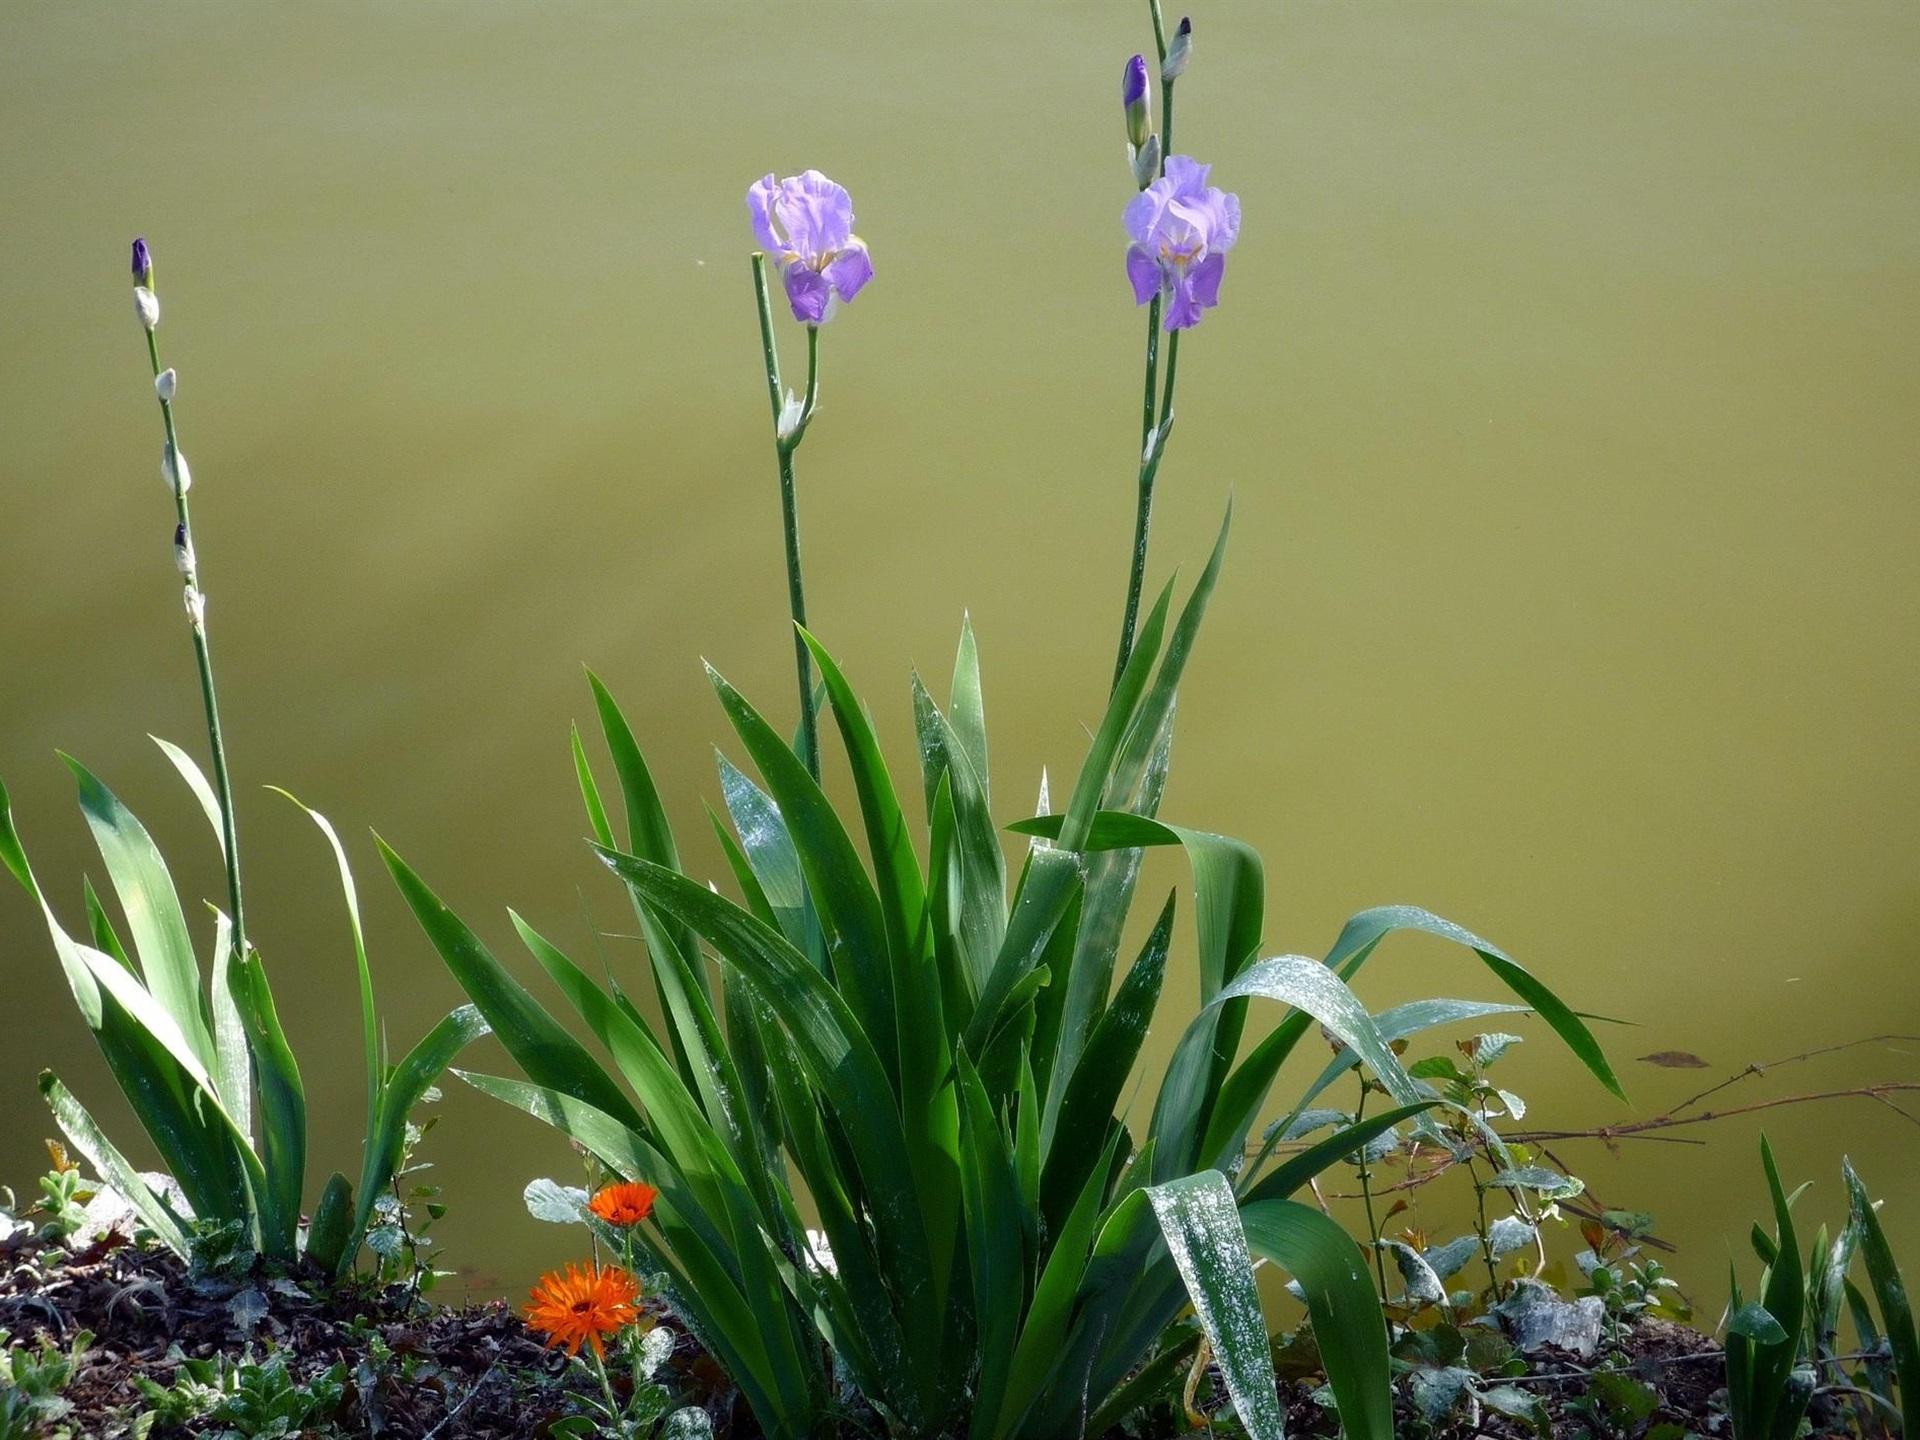 Fondos De Pantalla Iris Flores Moradas Hojas Verdes 1920x1440 Hd Imagen